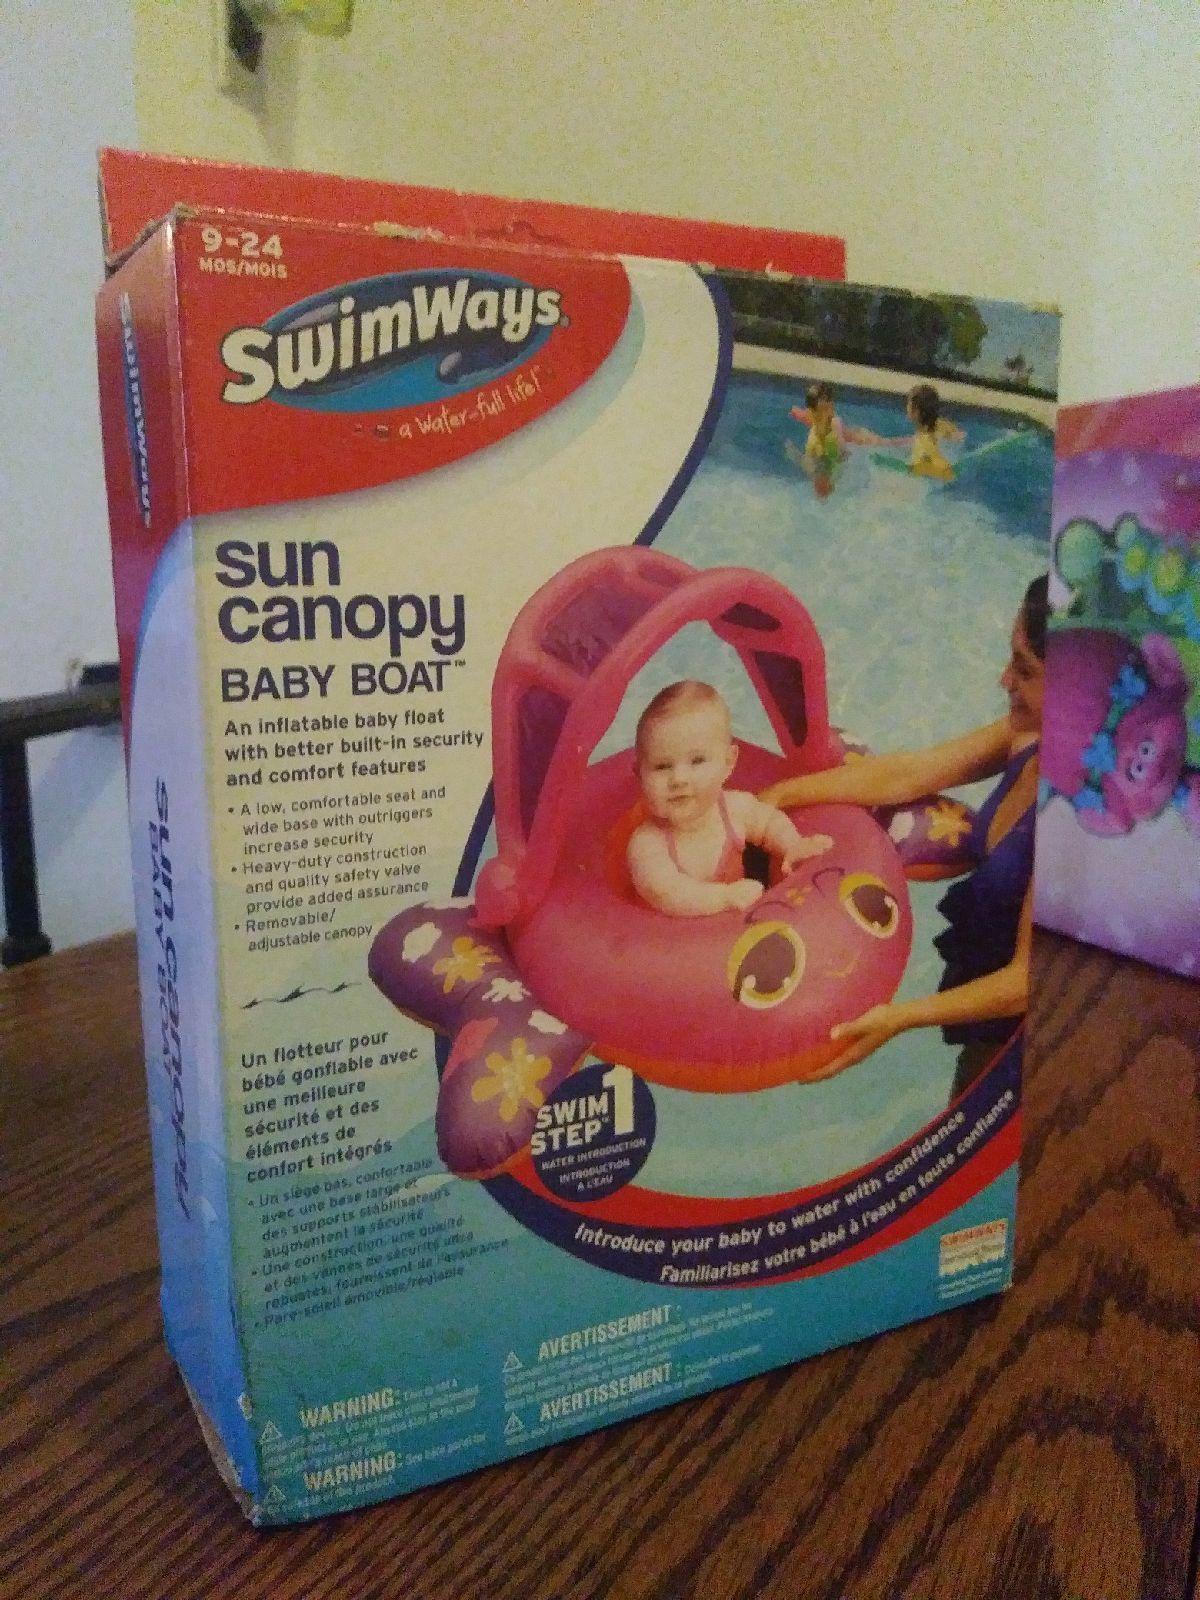 Sun Canopy baby boat  sc 1 st  Mercari & Sun Canopy baby boat - Mercari: BUY u0026 SELL THINGS YOU LOVE